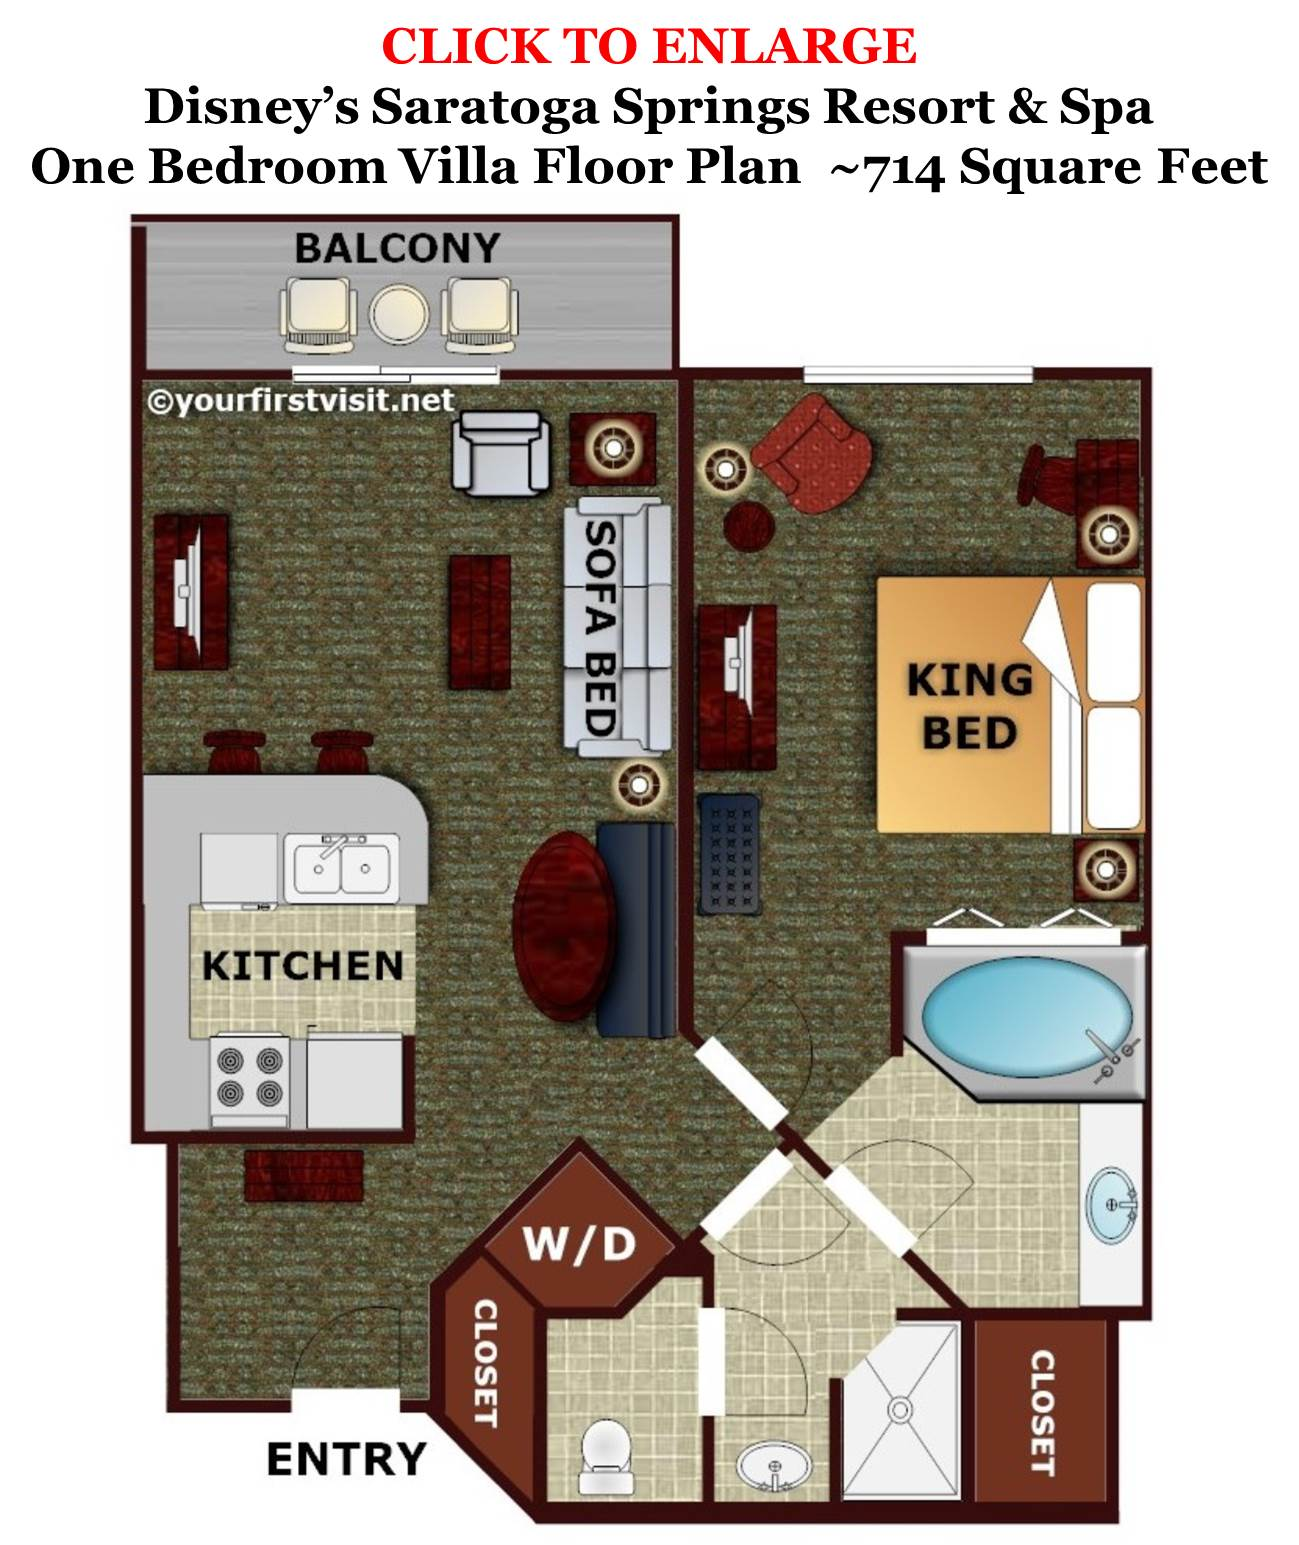 Saratoga Springs Treehouse Villas Floor Plan Review Disney S Saratoga Springs Resort Amp Spa Page 4